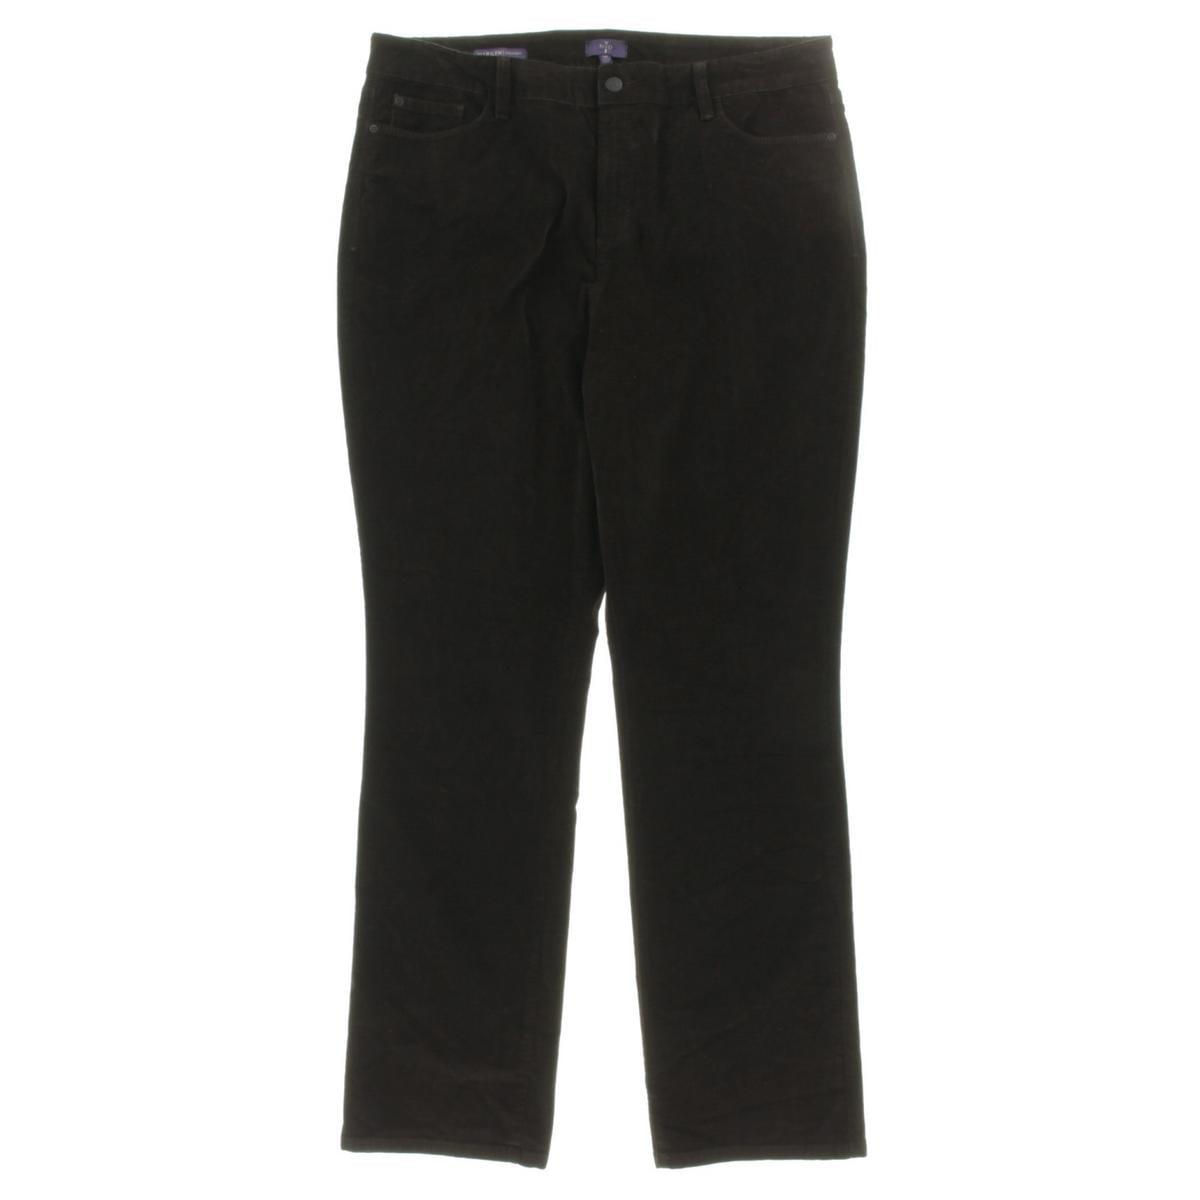 NYDJ Womens Corduroy Slimming Fit Corduroy Pants